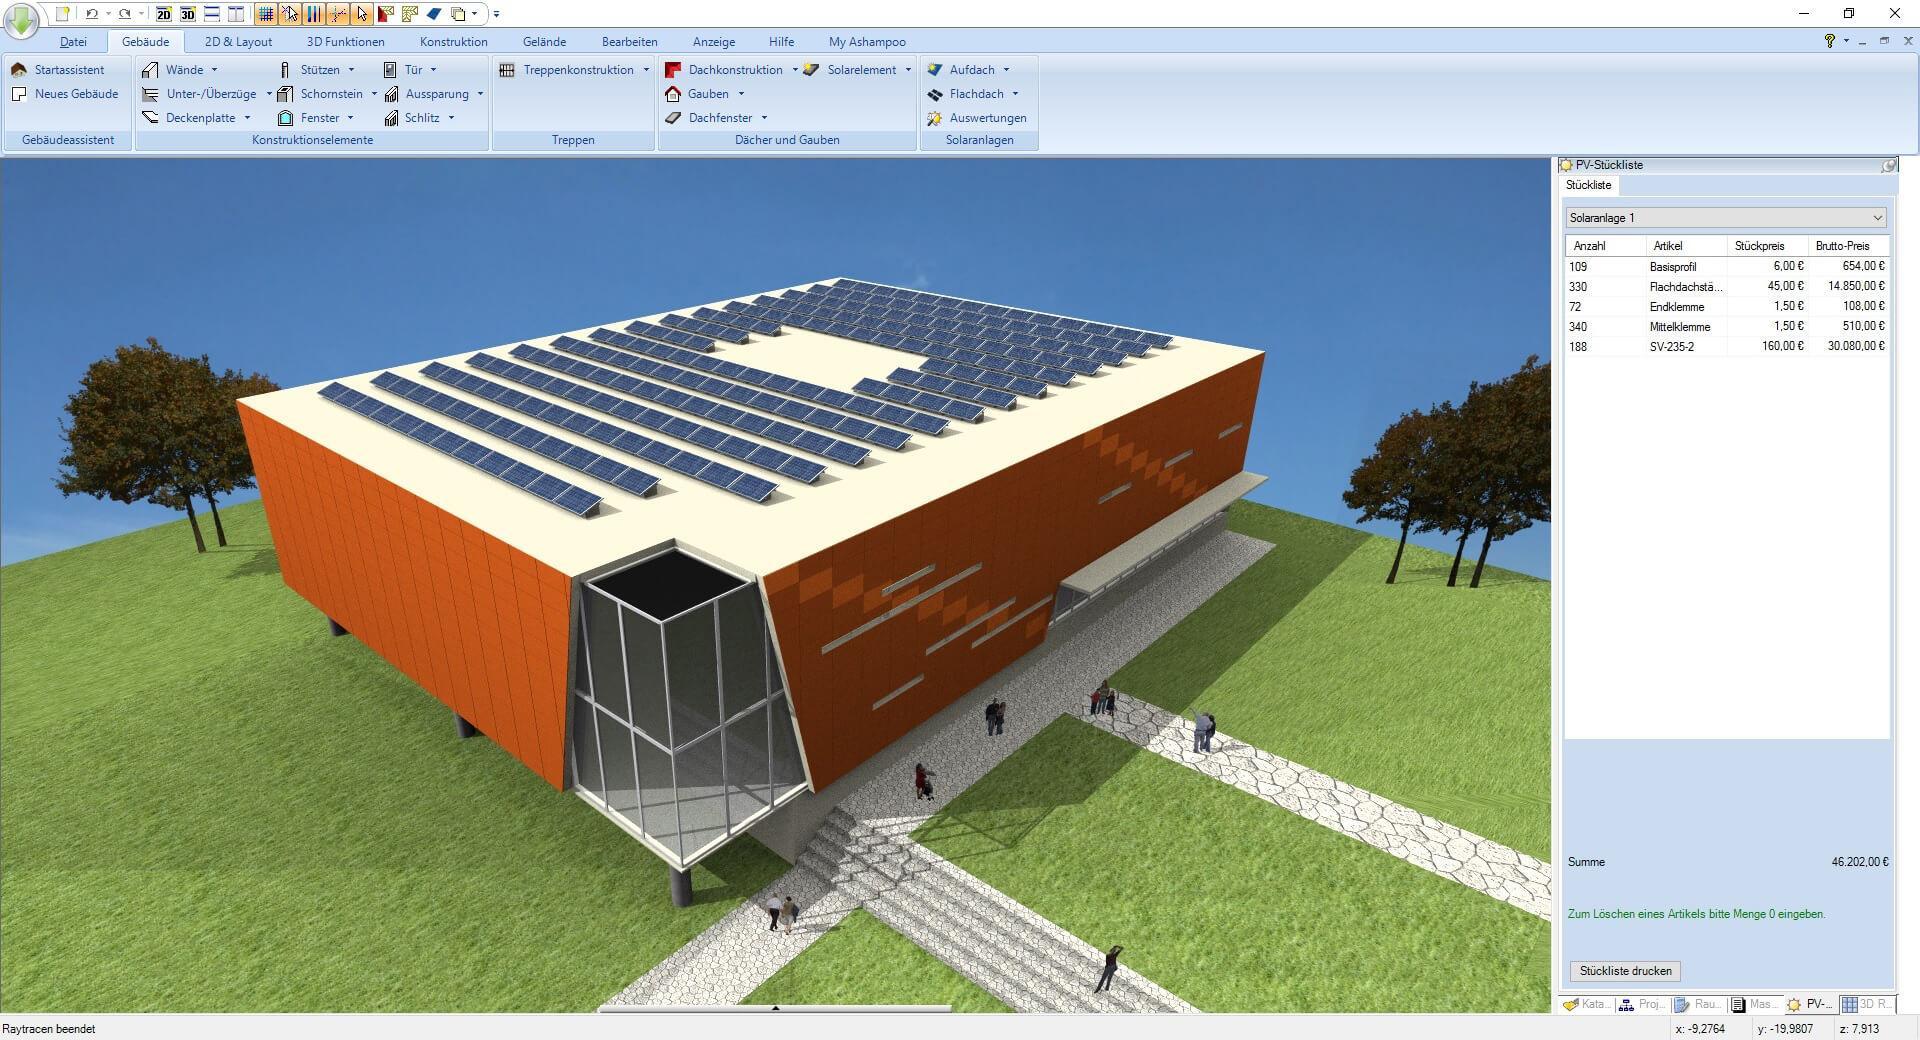 3 - Ashampoo 3D CAD Professional 7 erschienen